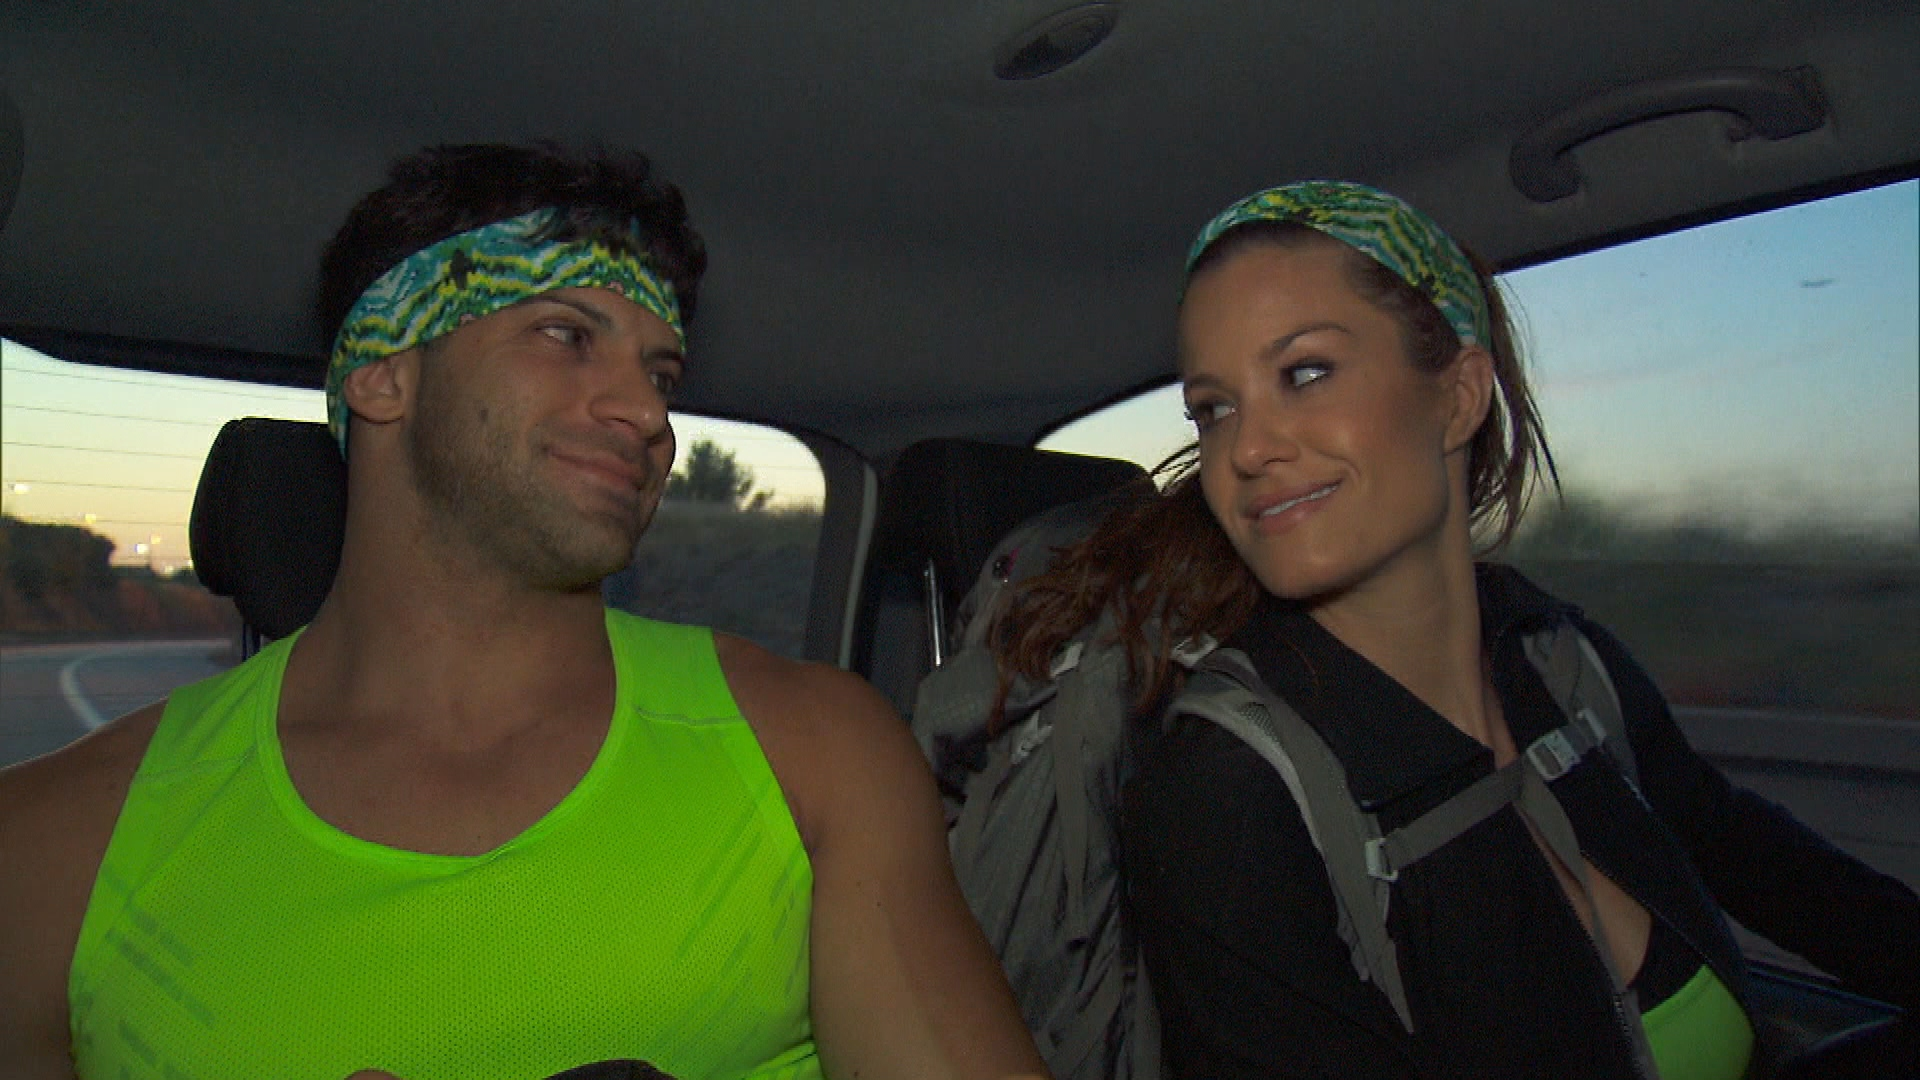 Robbie and Brooke